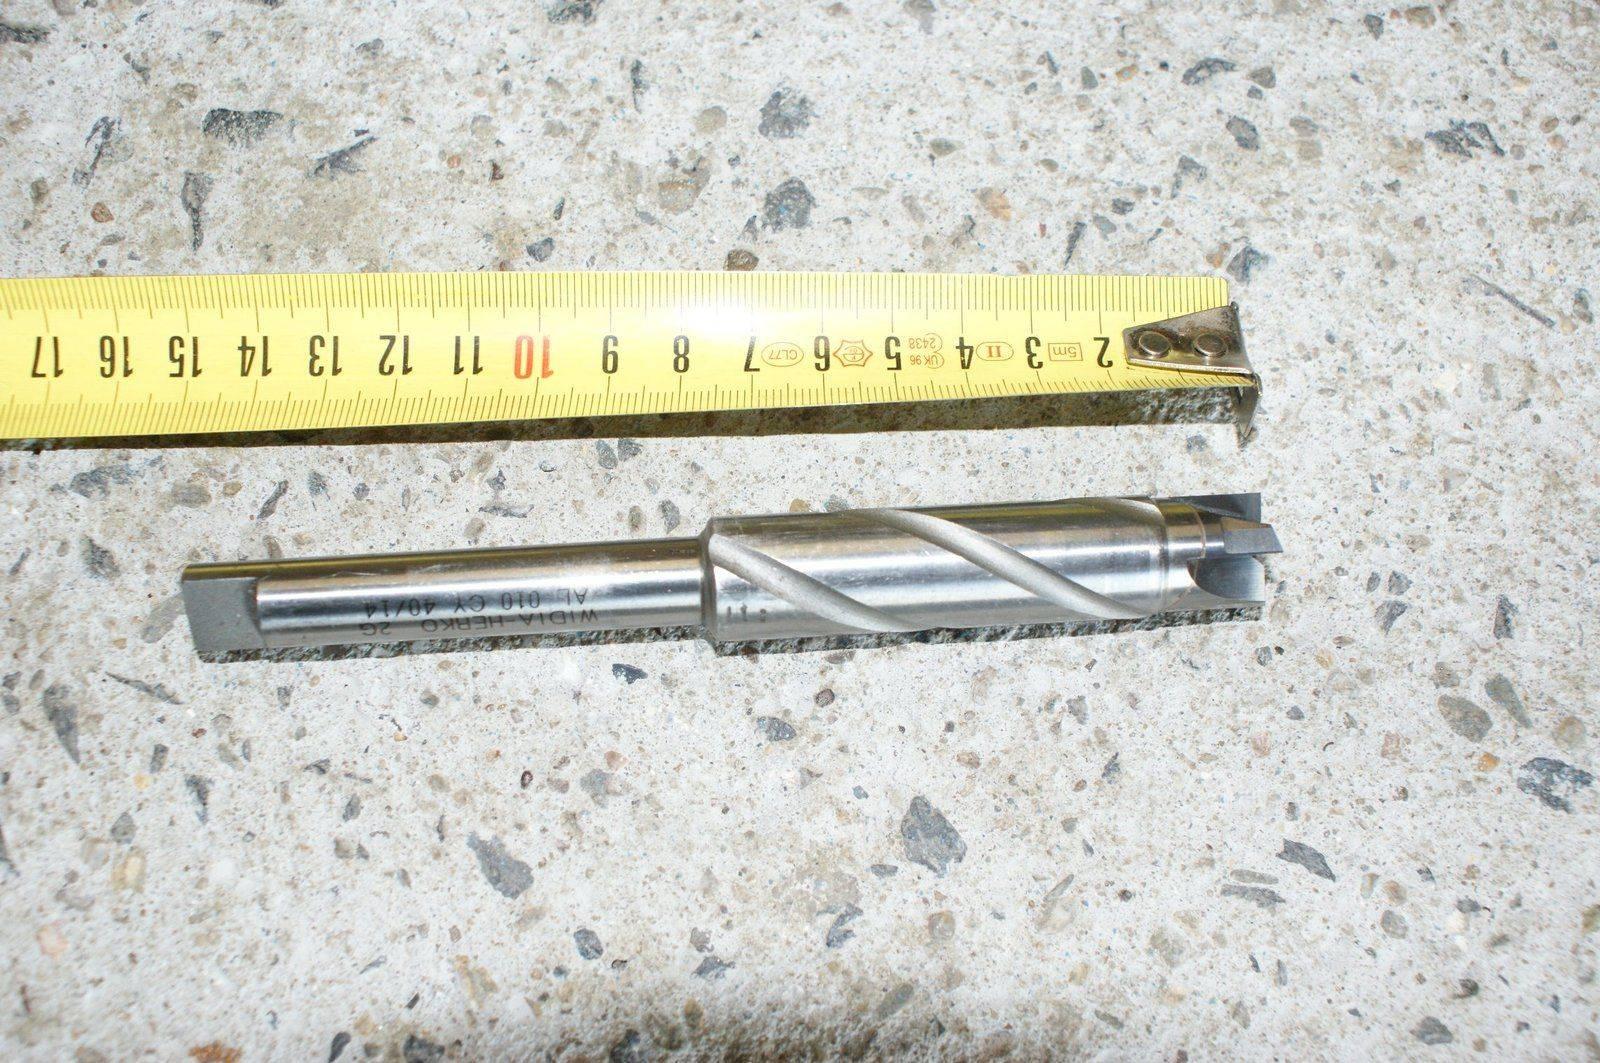 DSC00581.JPG